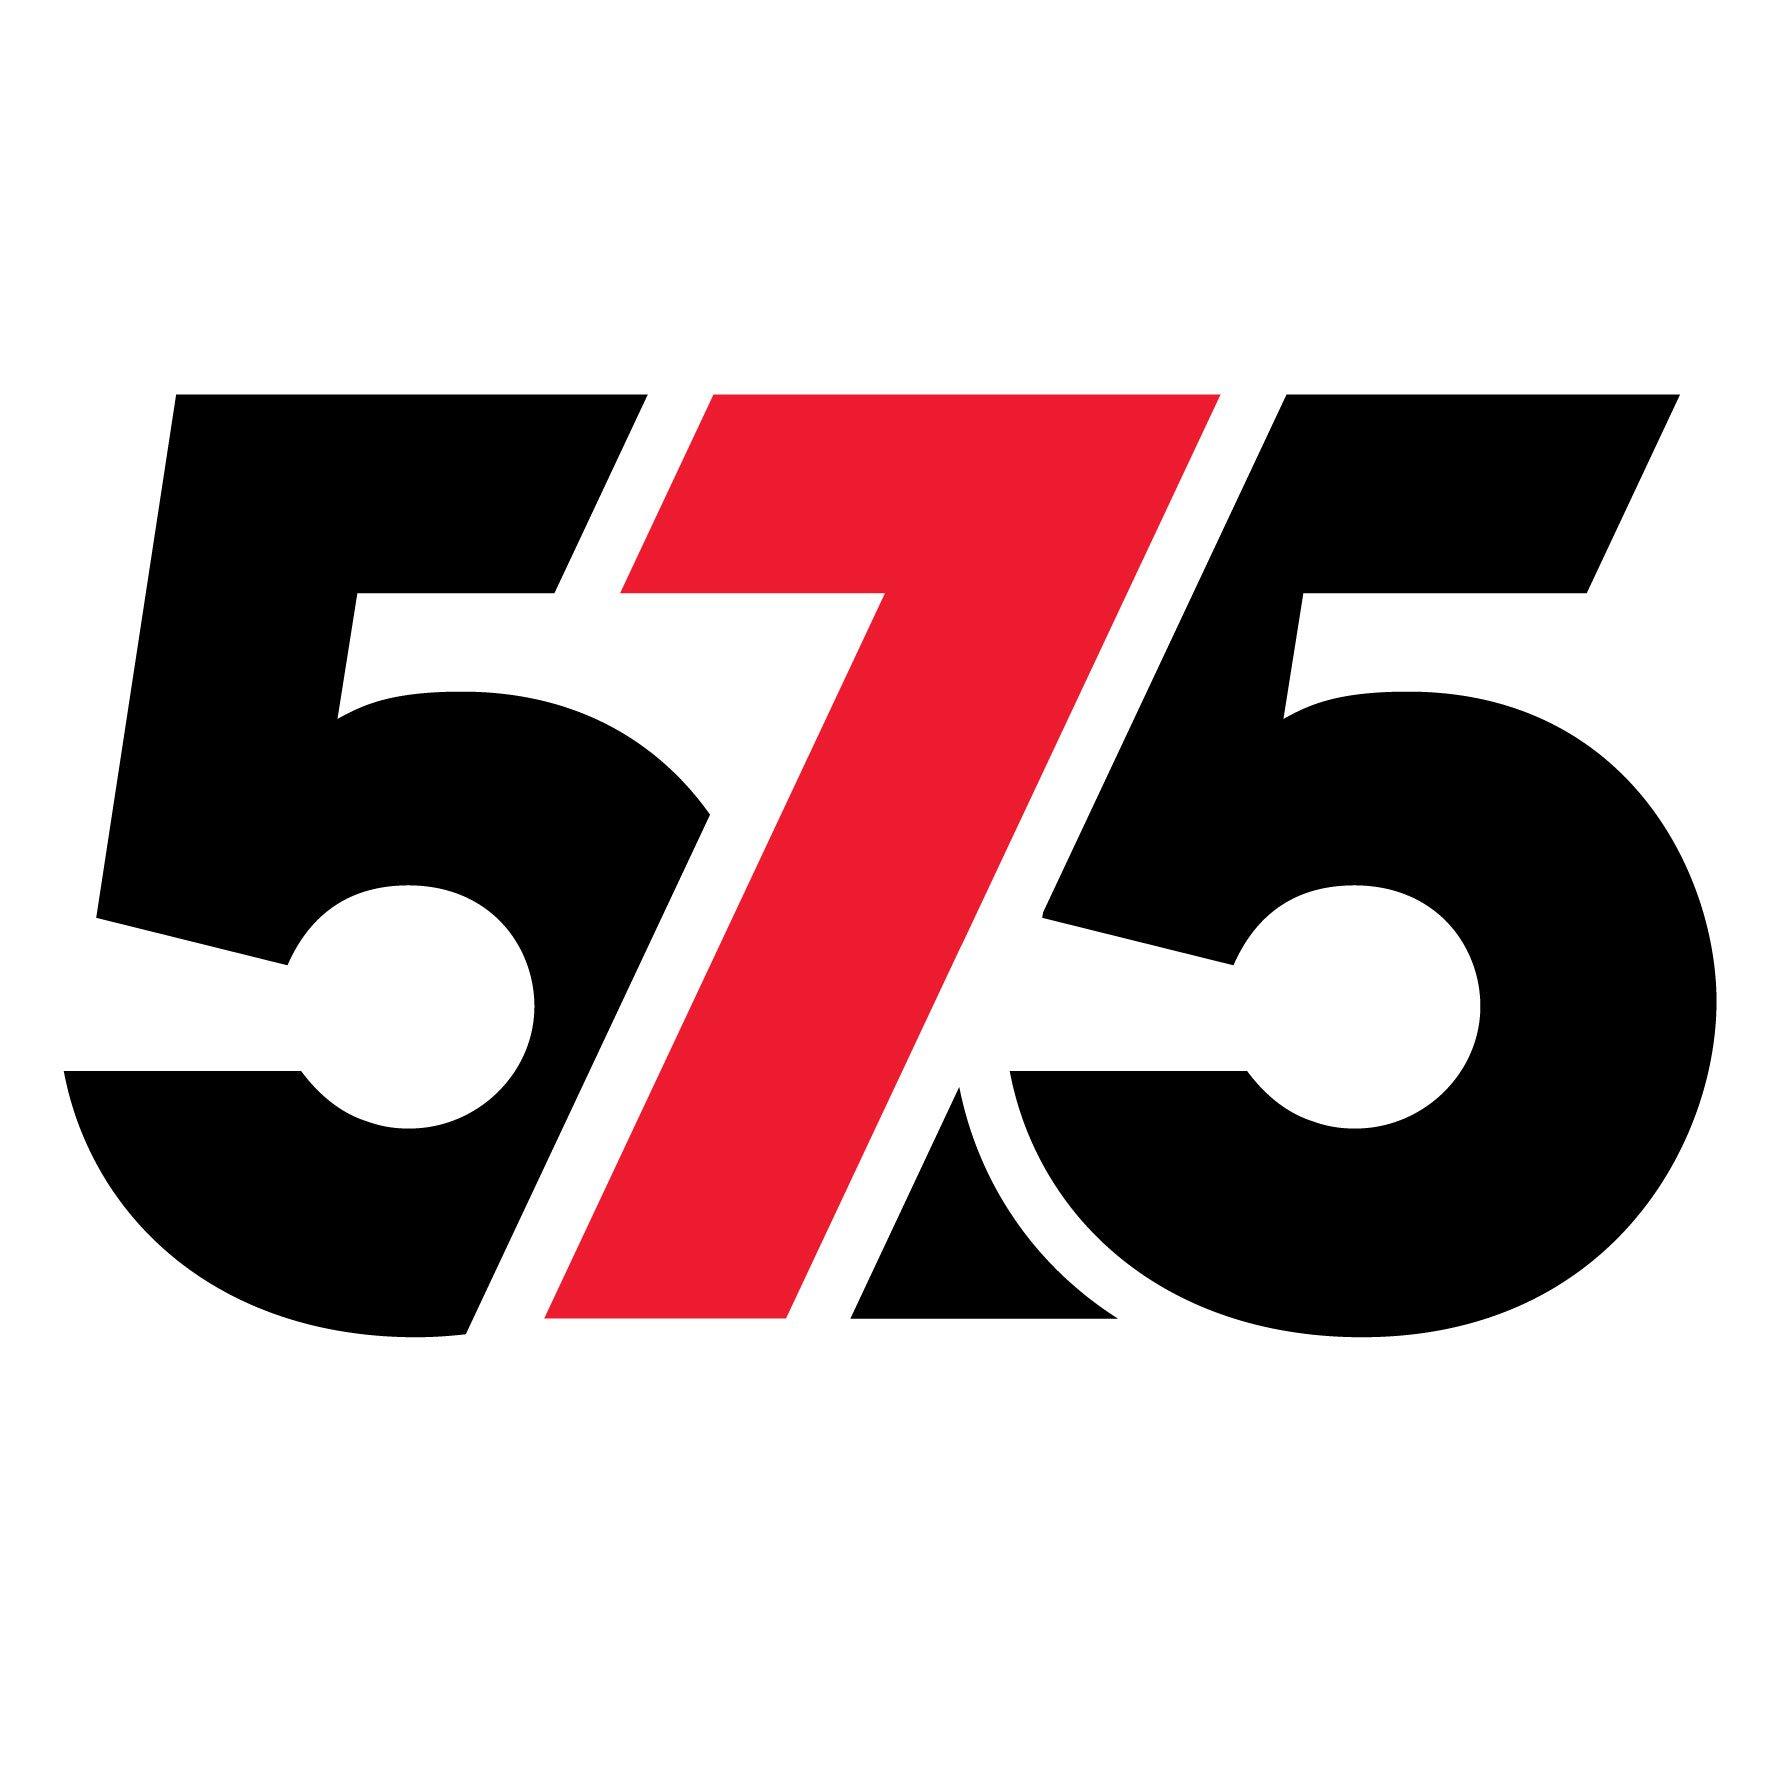 575 Triathlon